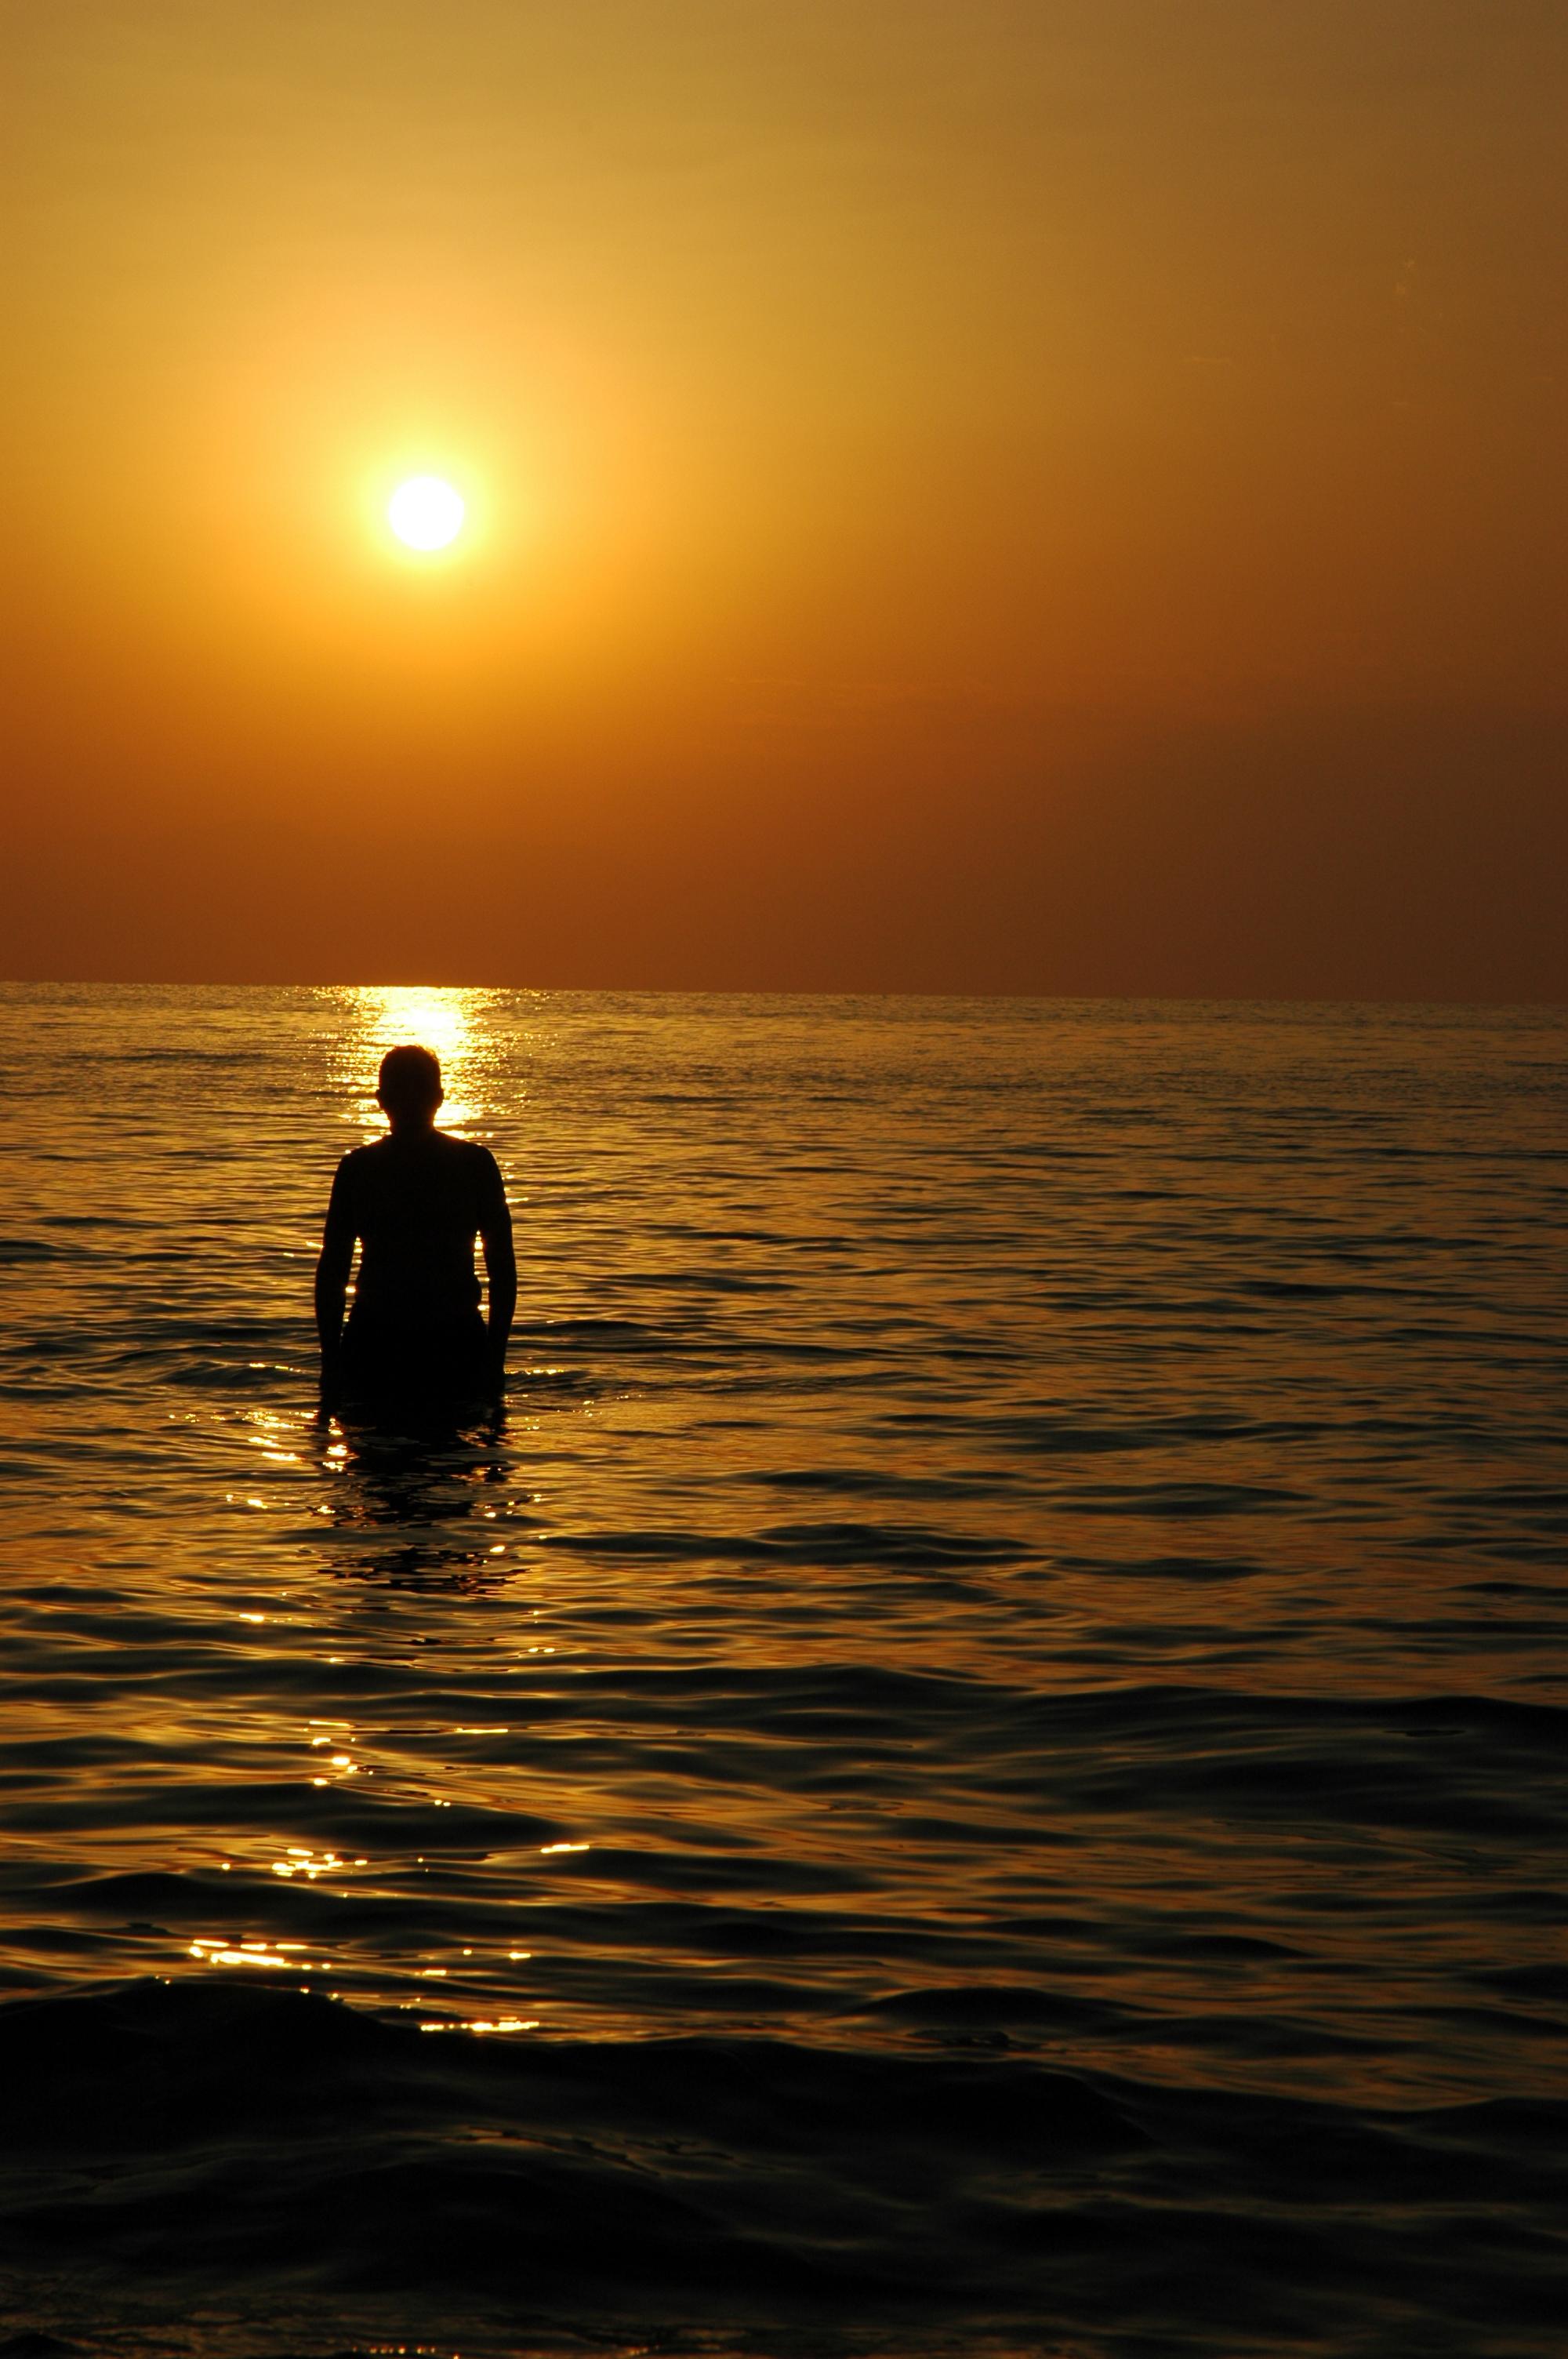 silhouette in sunset ocean